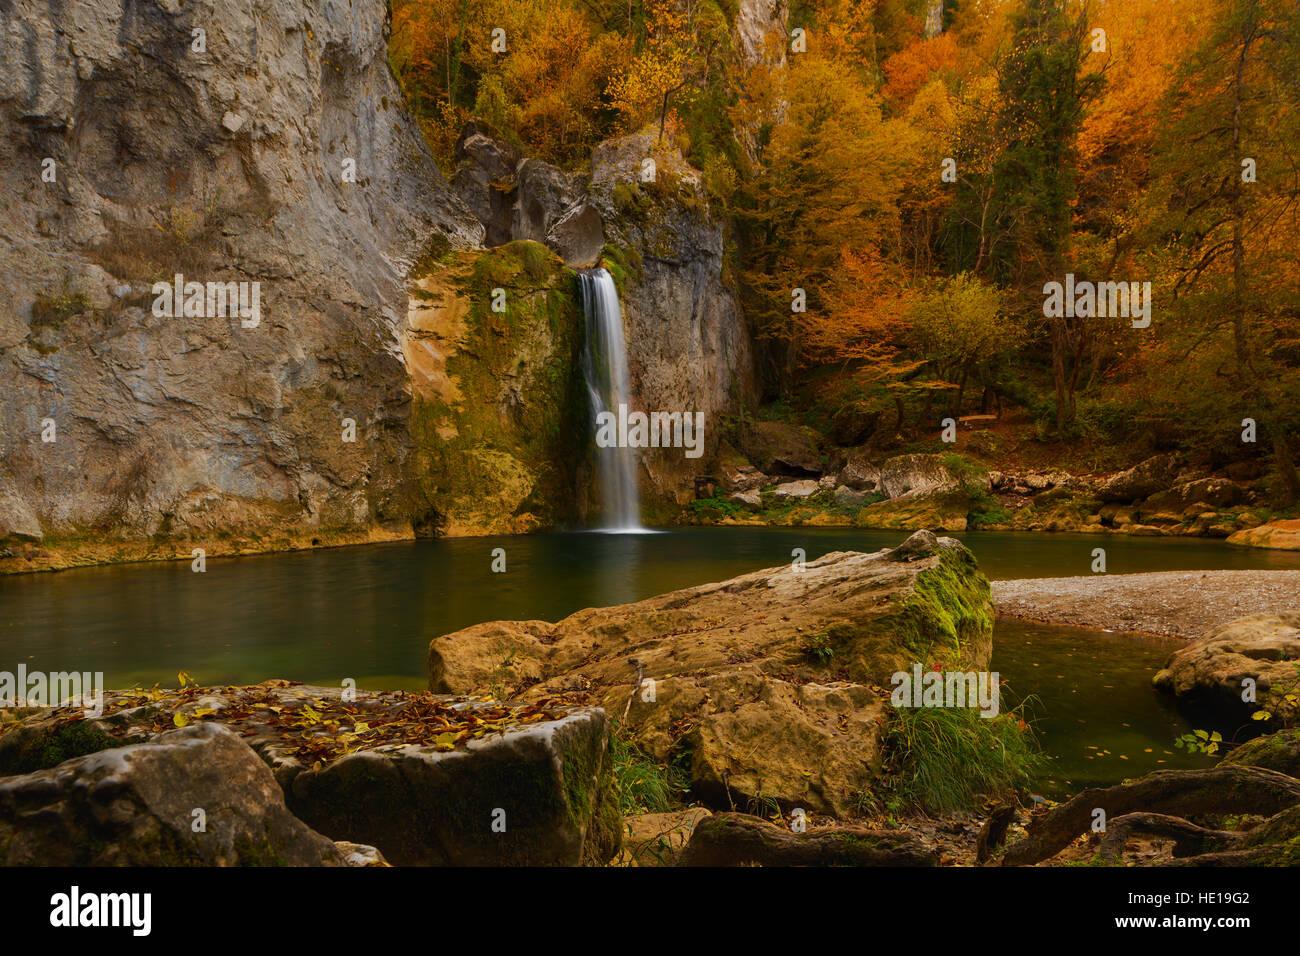 Landscape of Ilica waterfall with beautiful autumn nature of Kure Mountains in Kastamonu, Turkey - Stock Image